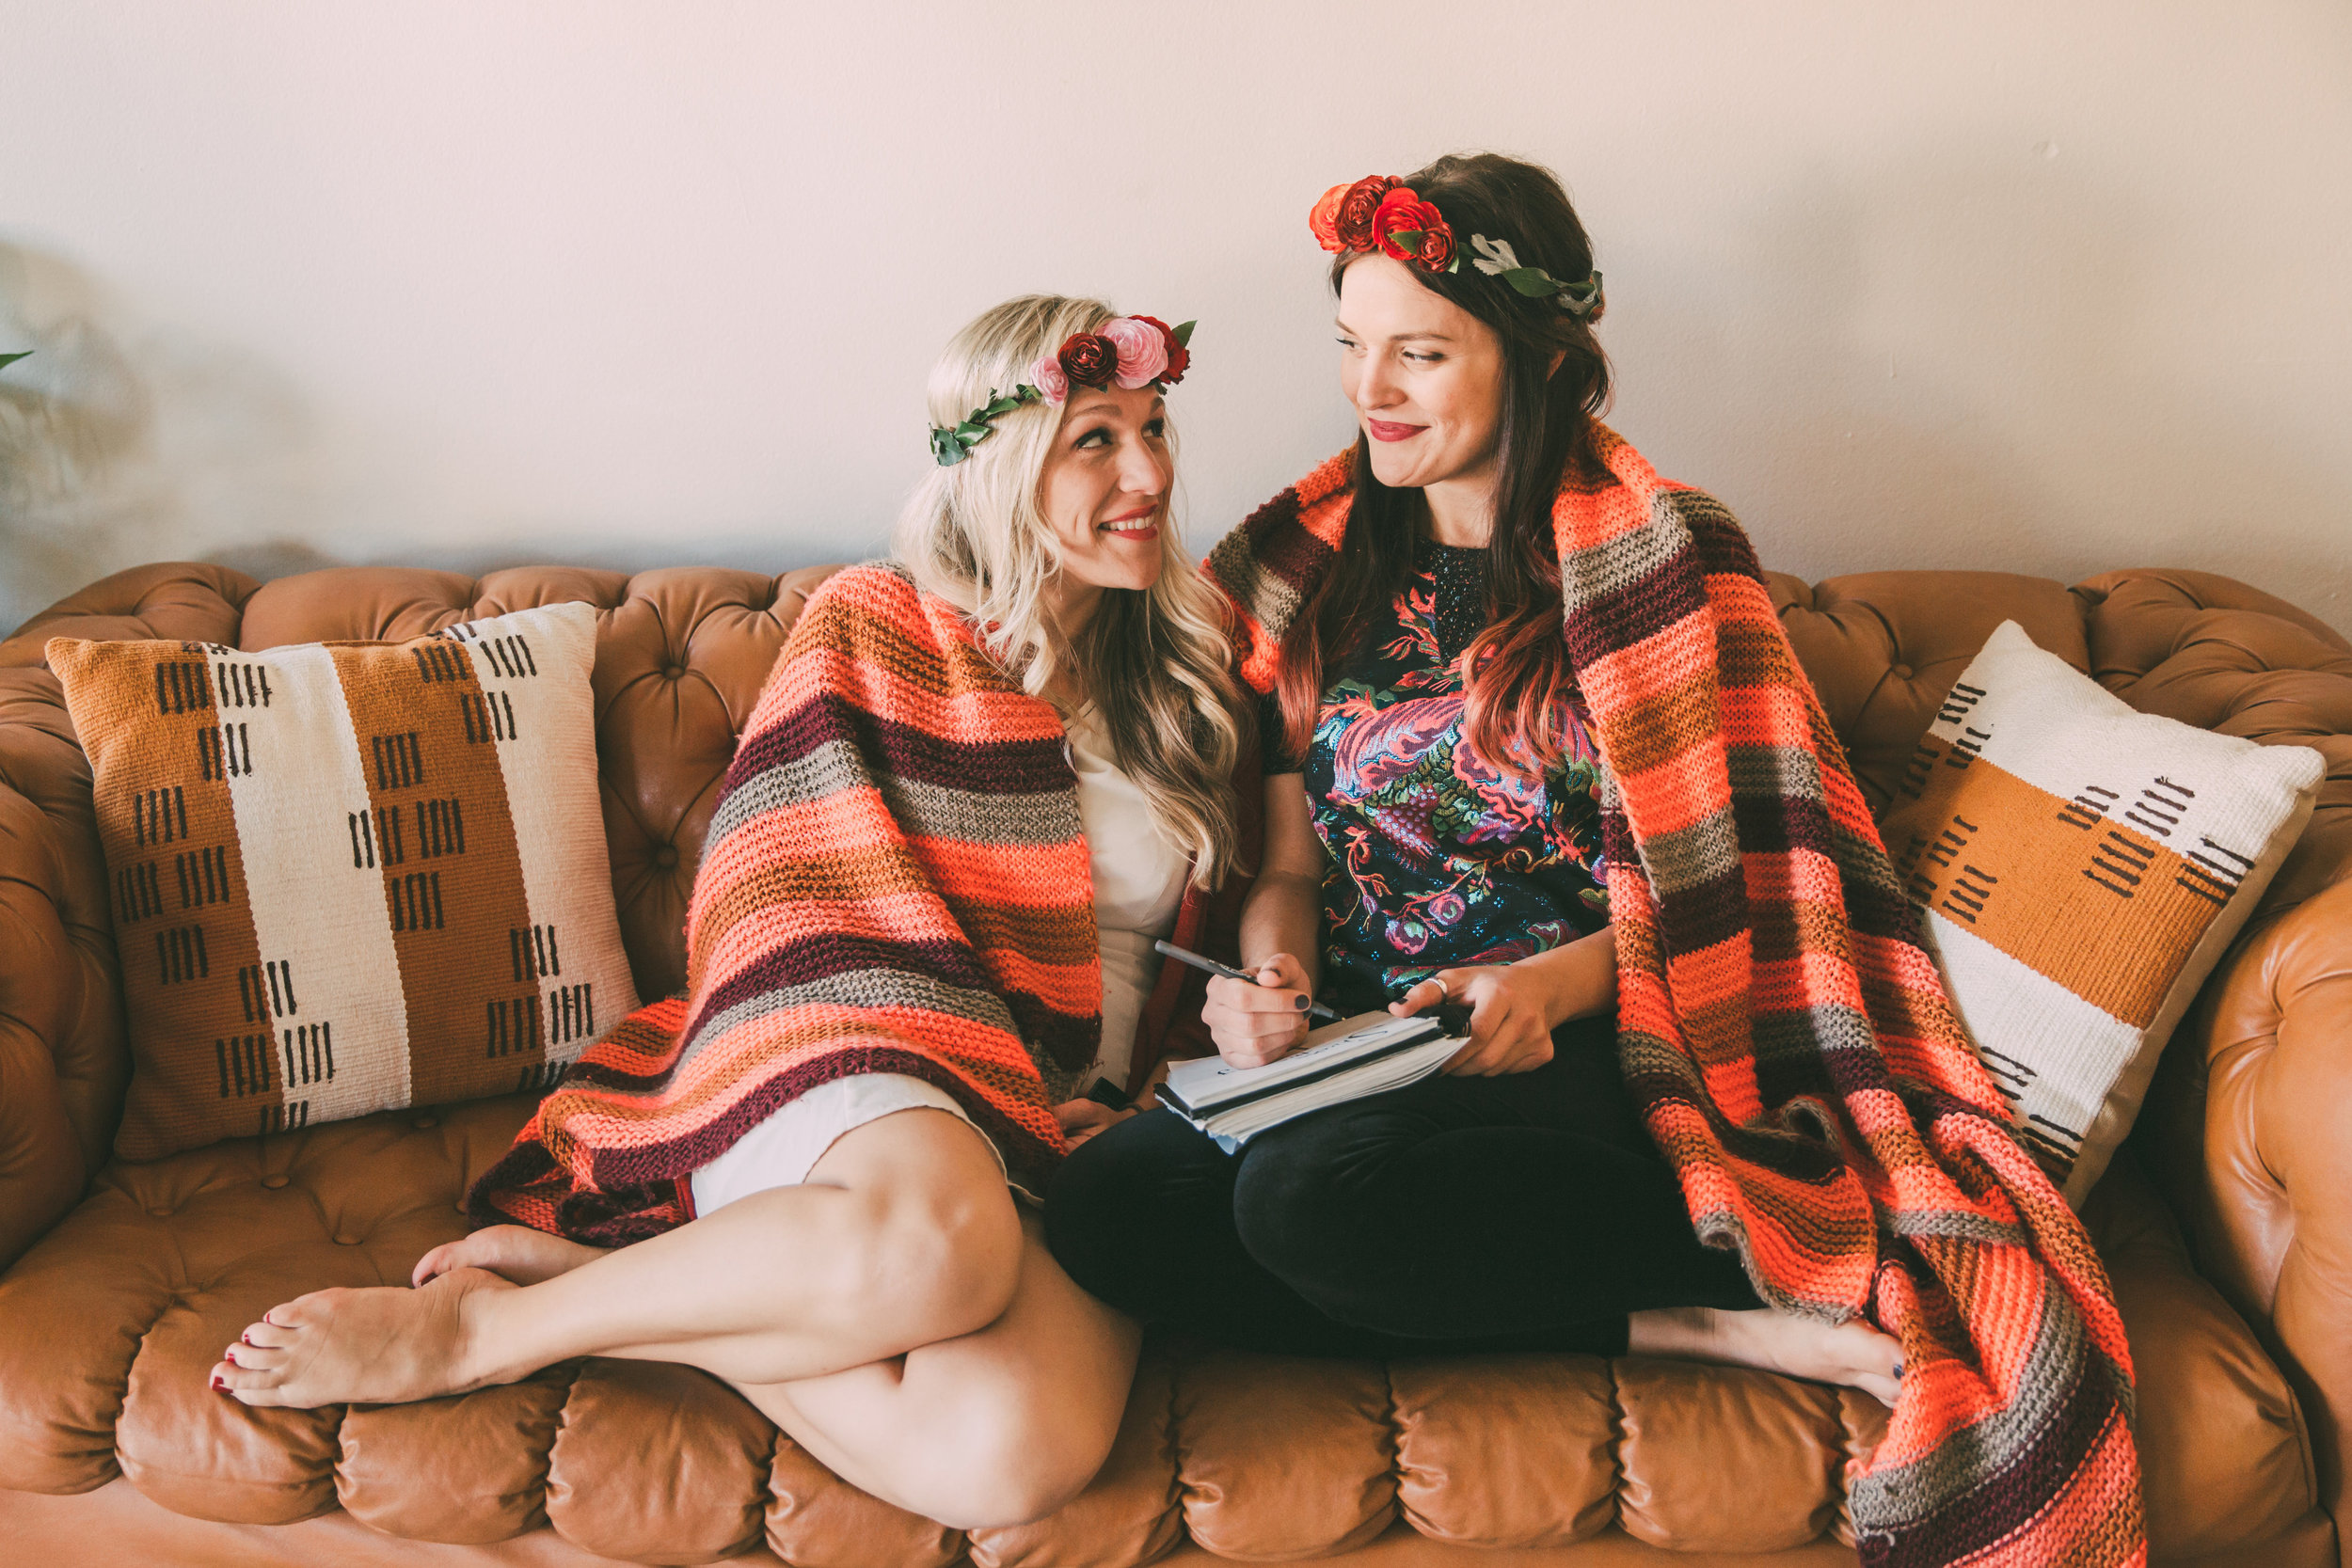 Sestra Homespun-Sestra Homespun Couch-0028 (1).jpg